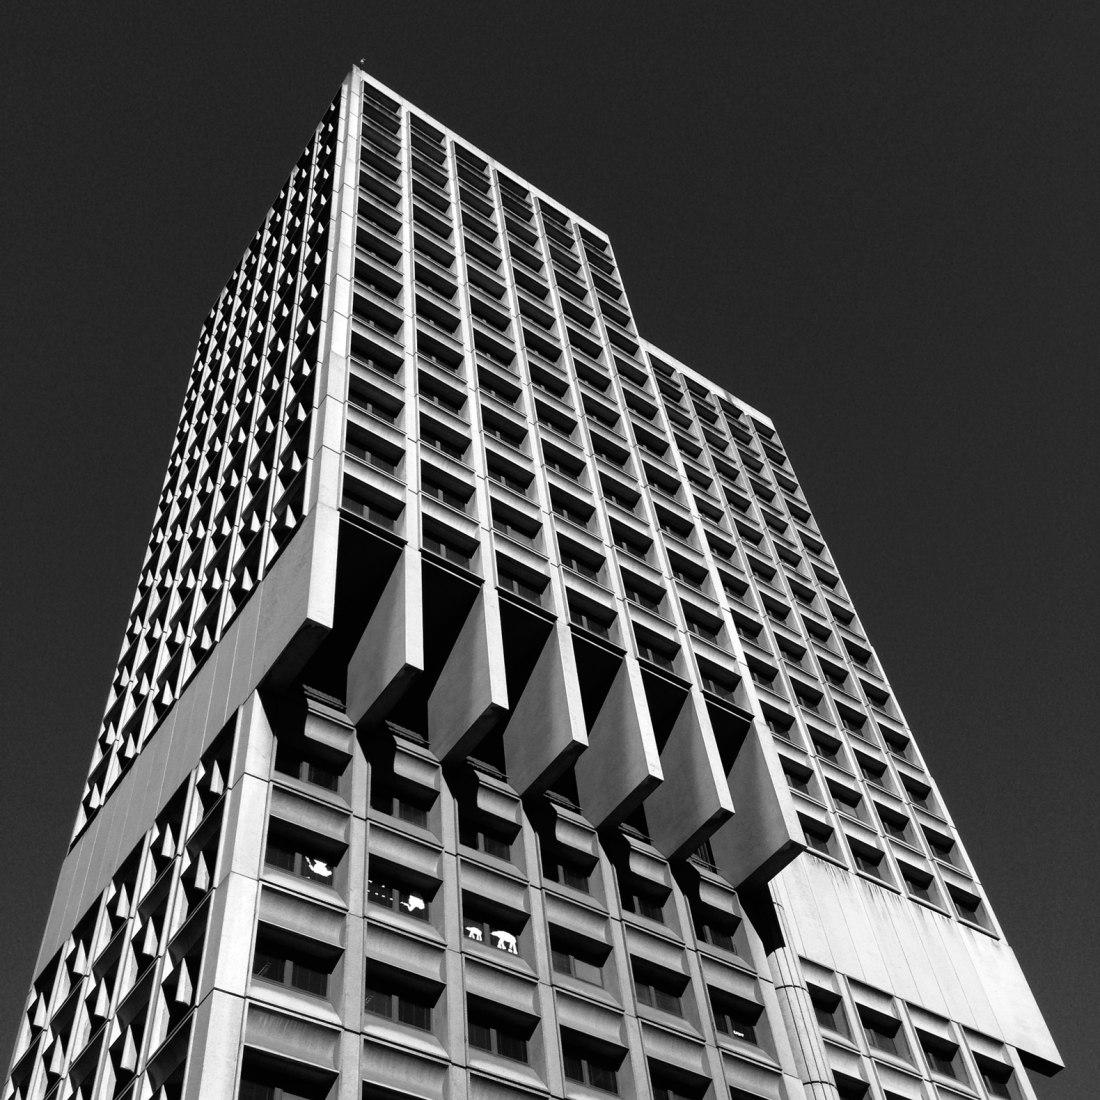 Ayuntamiento de Sydney. Brutalist Sydney por Blue Crow Media. Fotografía © Glenn Harper